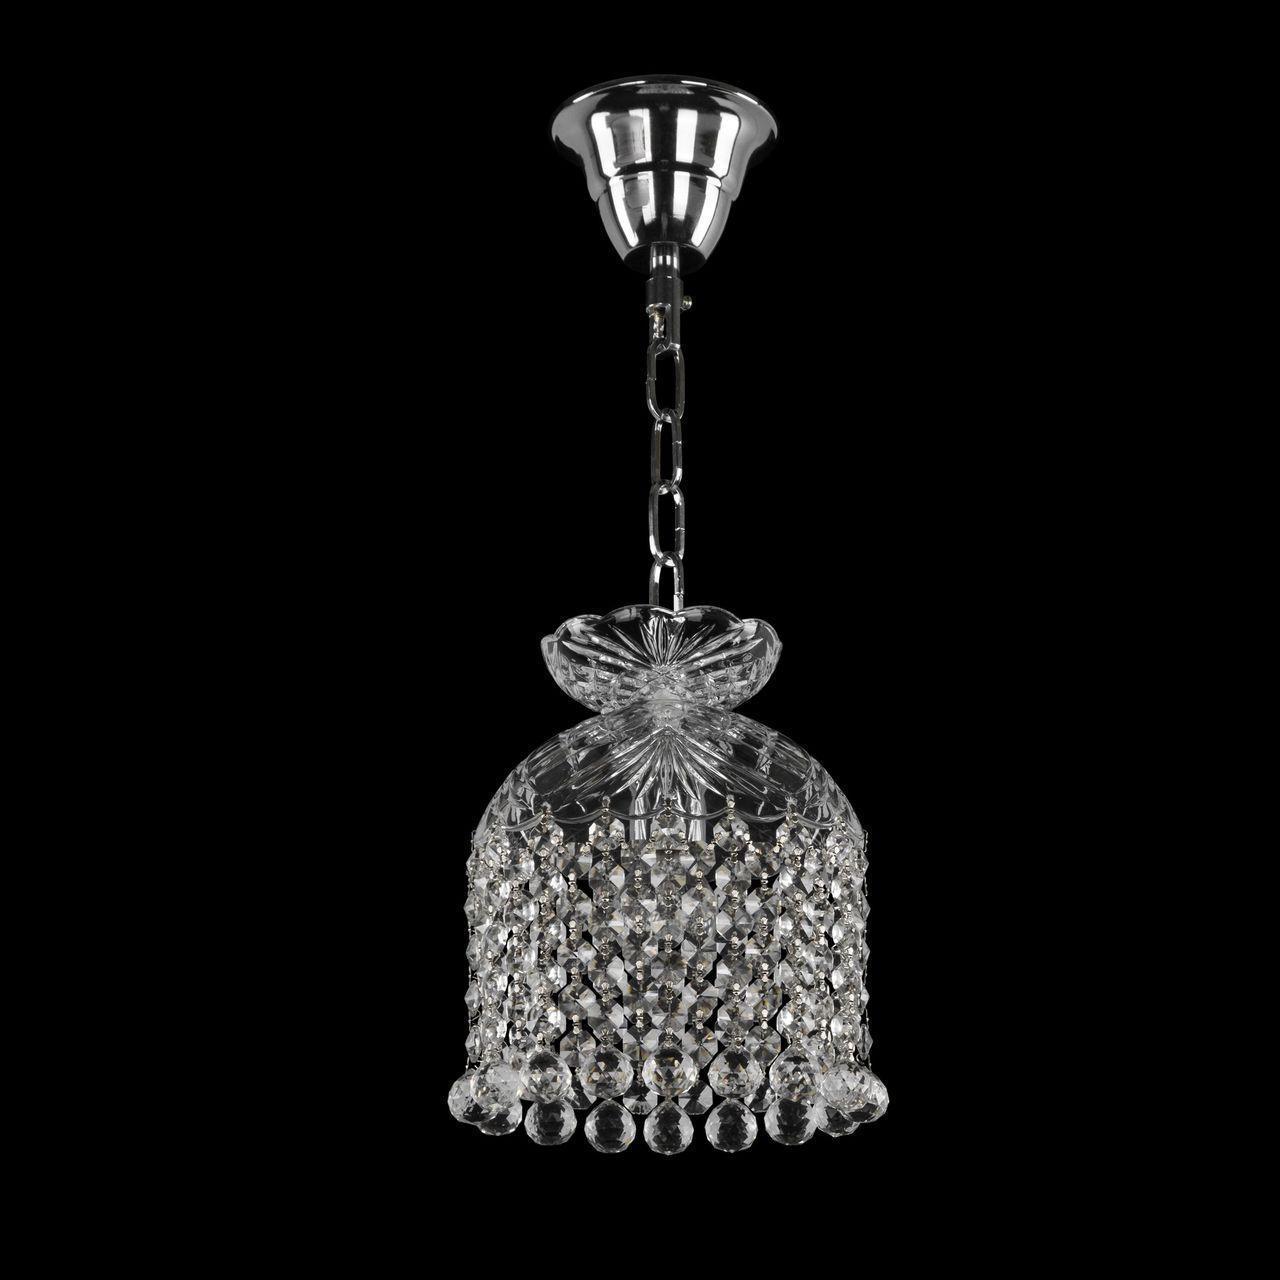 Подвесной светильник Bohemia Ivele 14783/16 Ni Balls